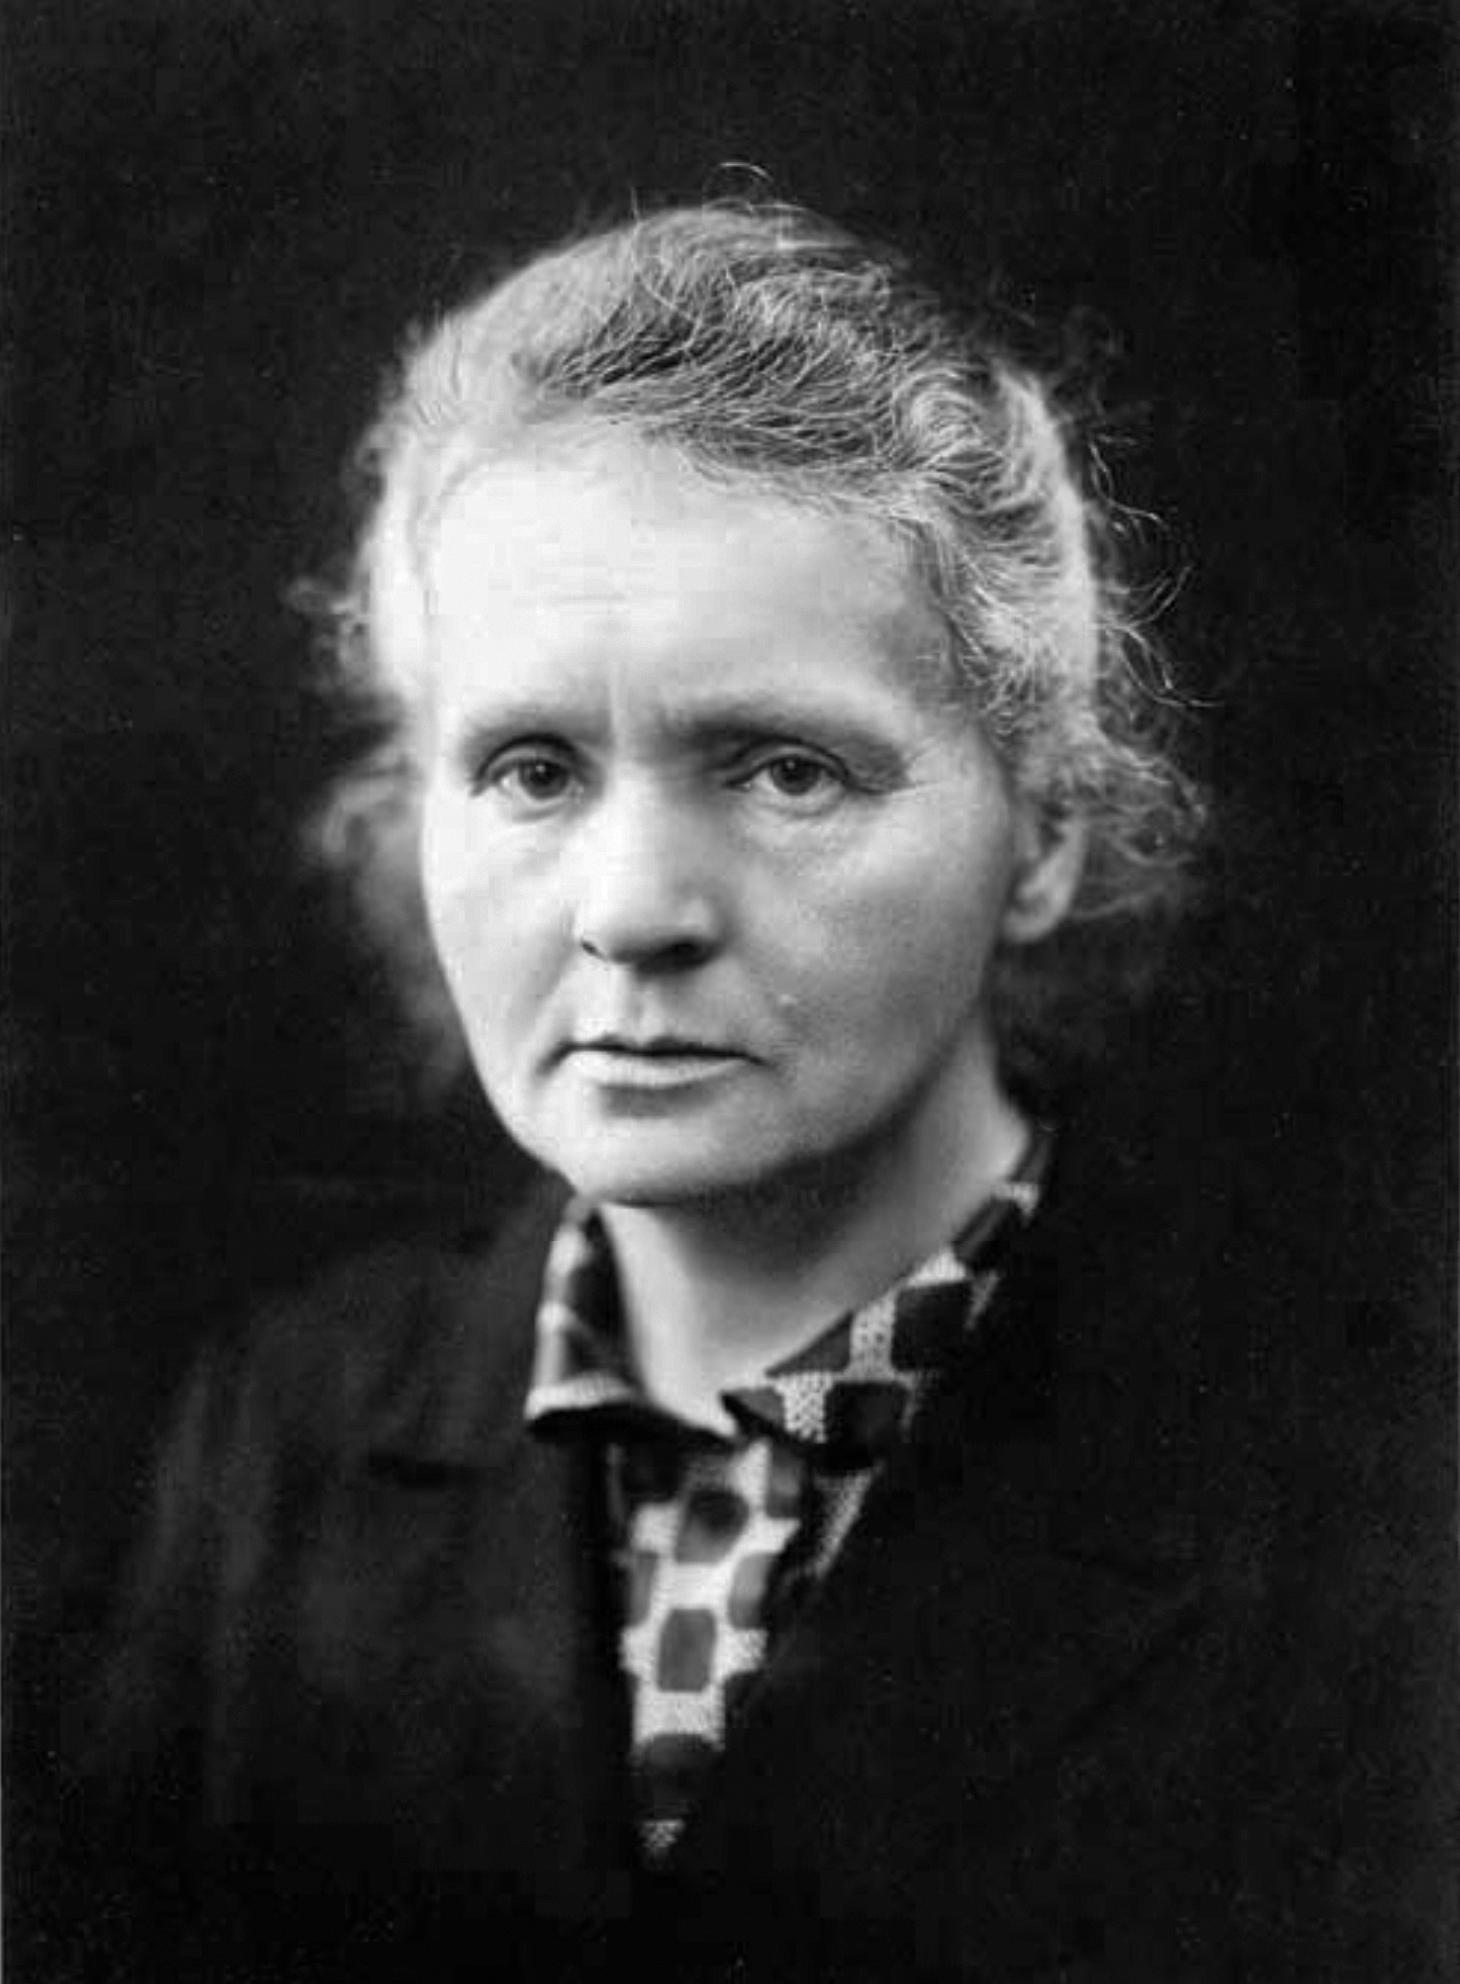 Marie Curie, née Sklodowska